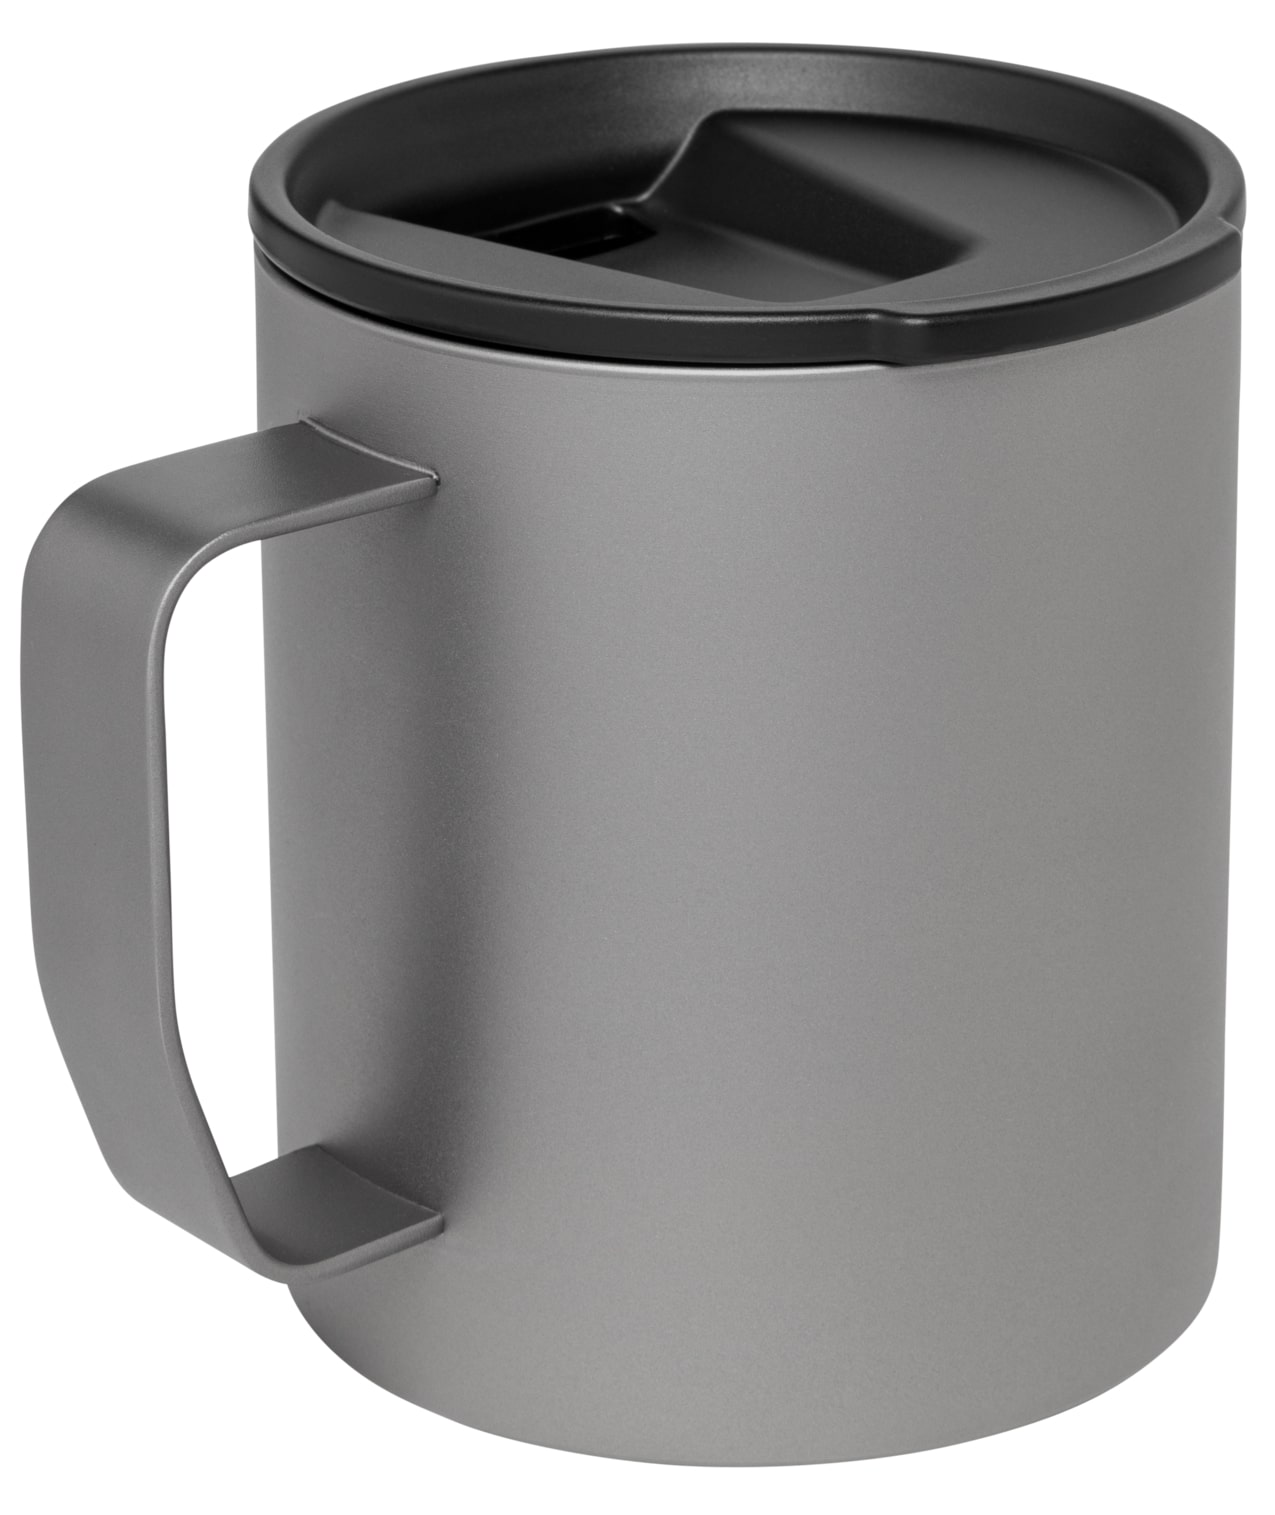 Stanley The Stay-Hot Titanium Camp Mug – 12OZ